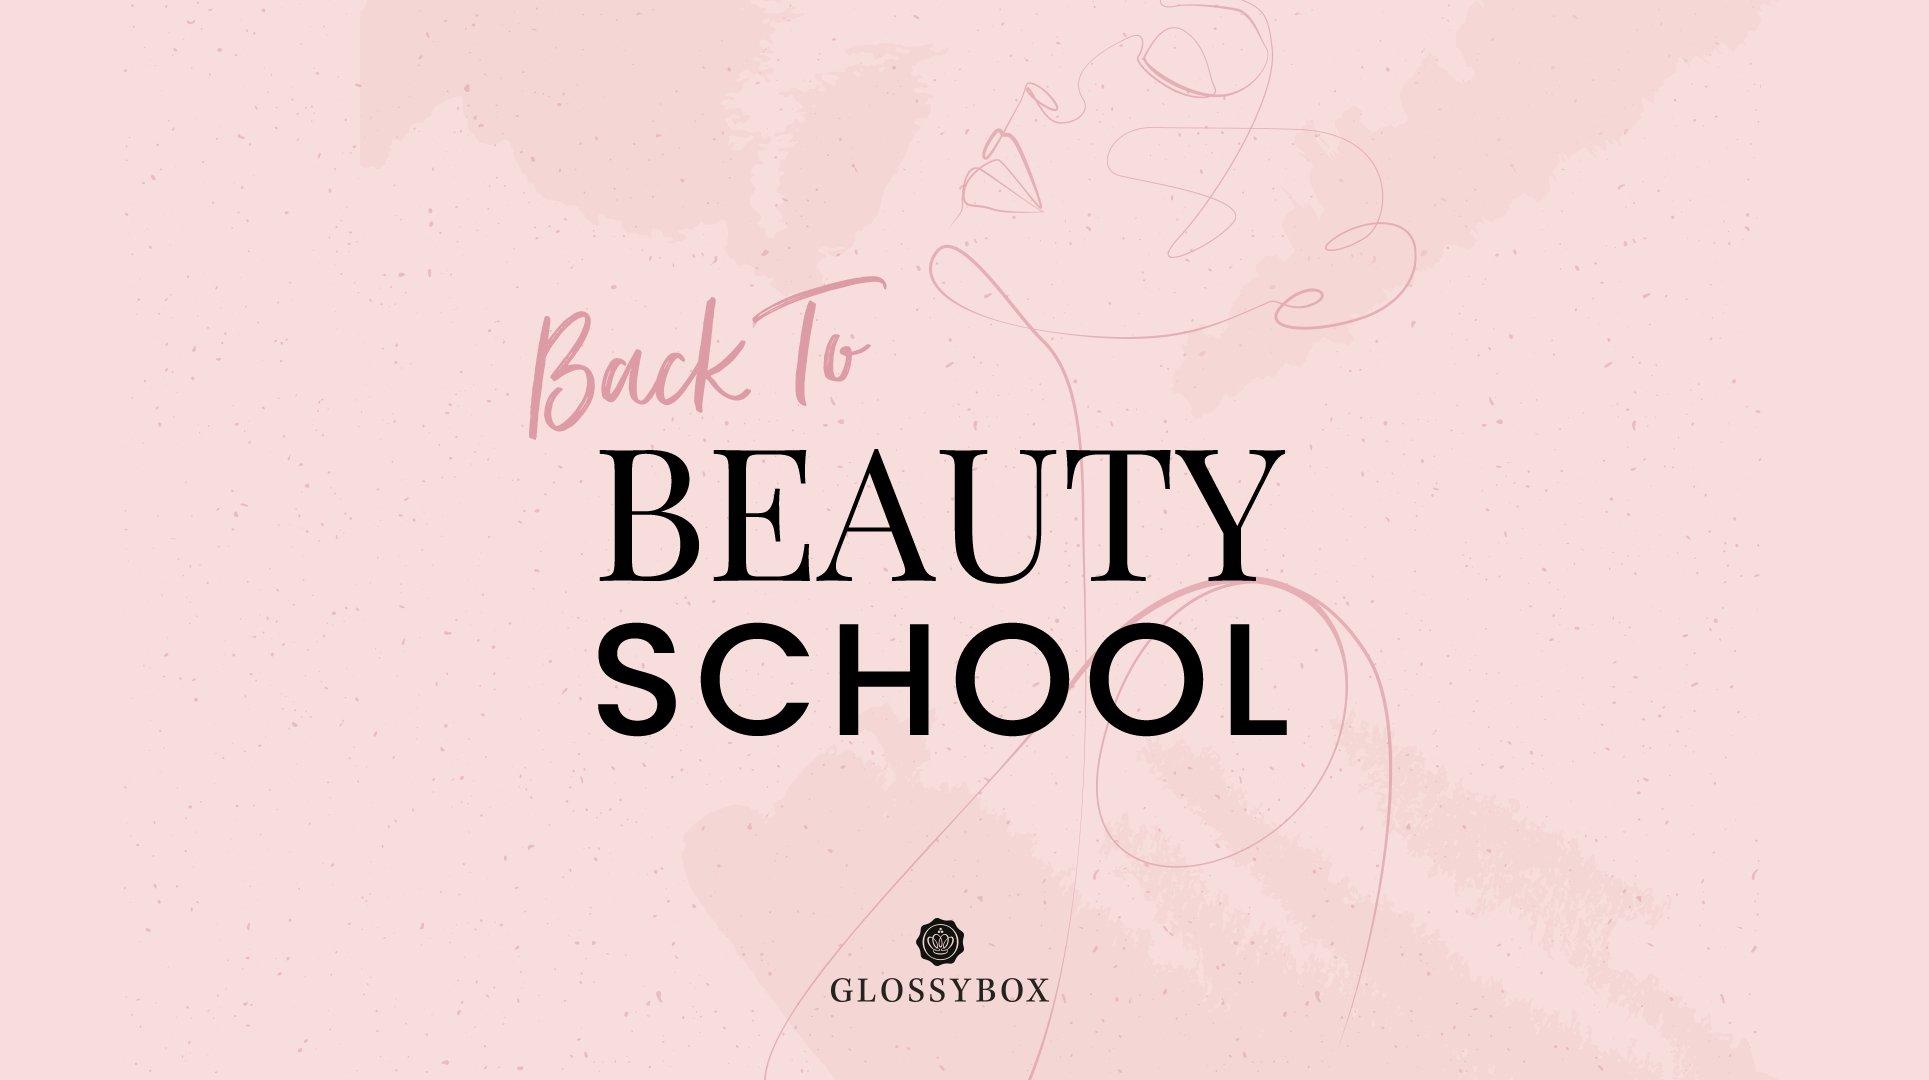 back-to-beauty-school-glossybox